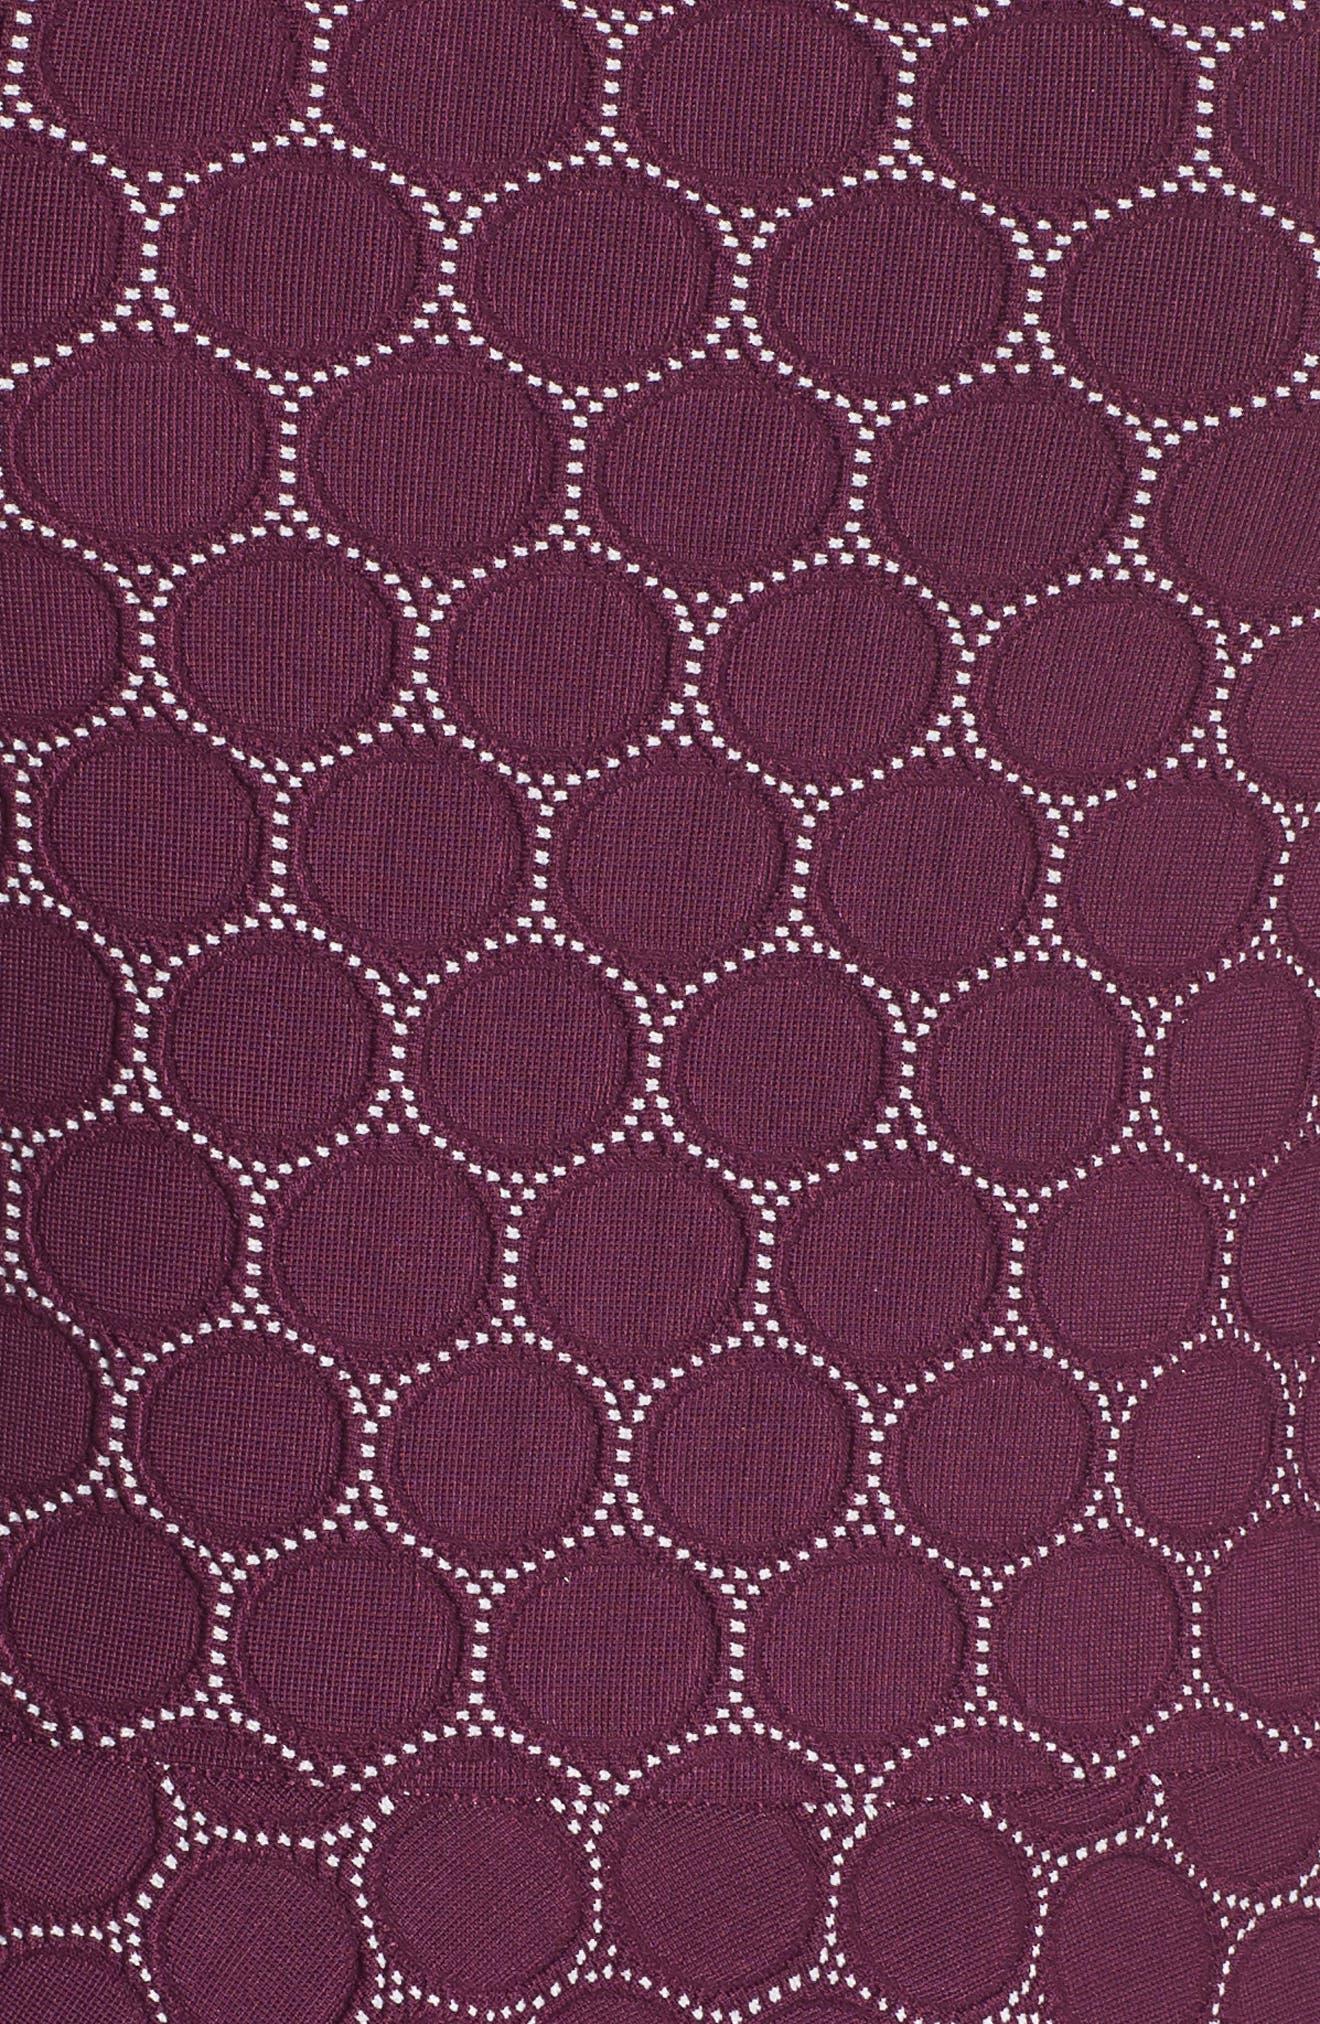 Circle Knit Fit & Flare Dress,                             Alternate thumbnail 5, color,                             Purple